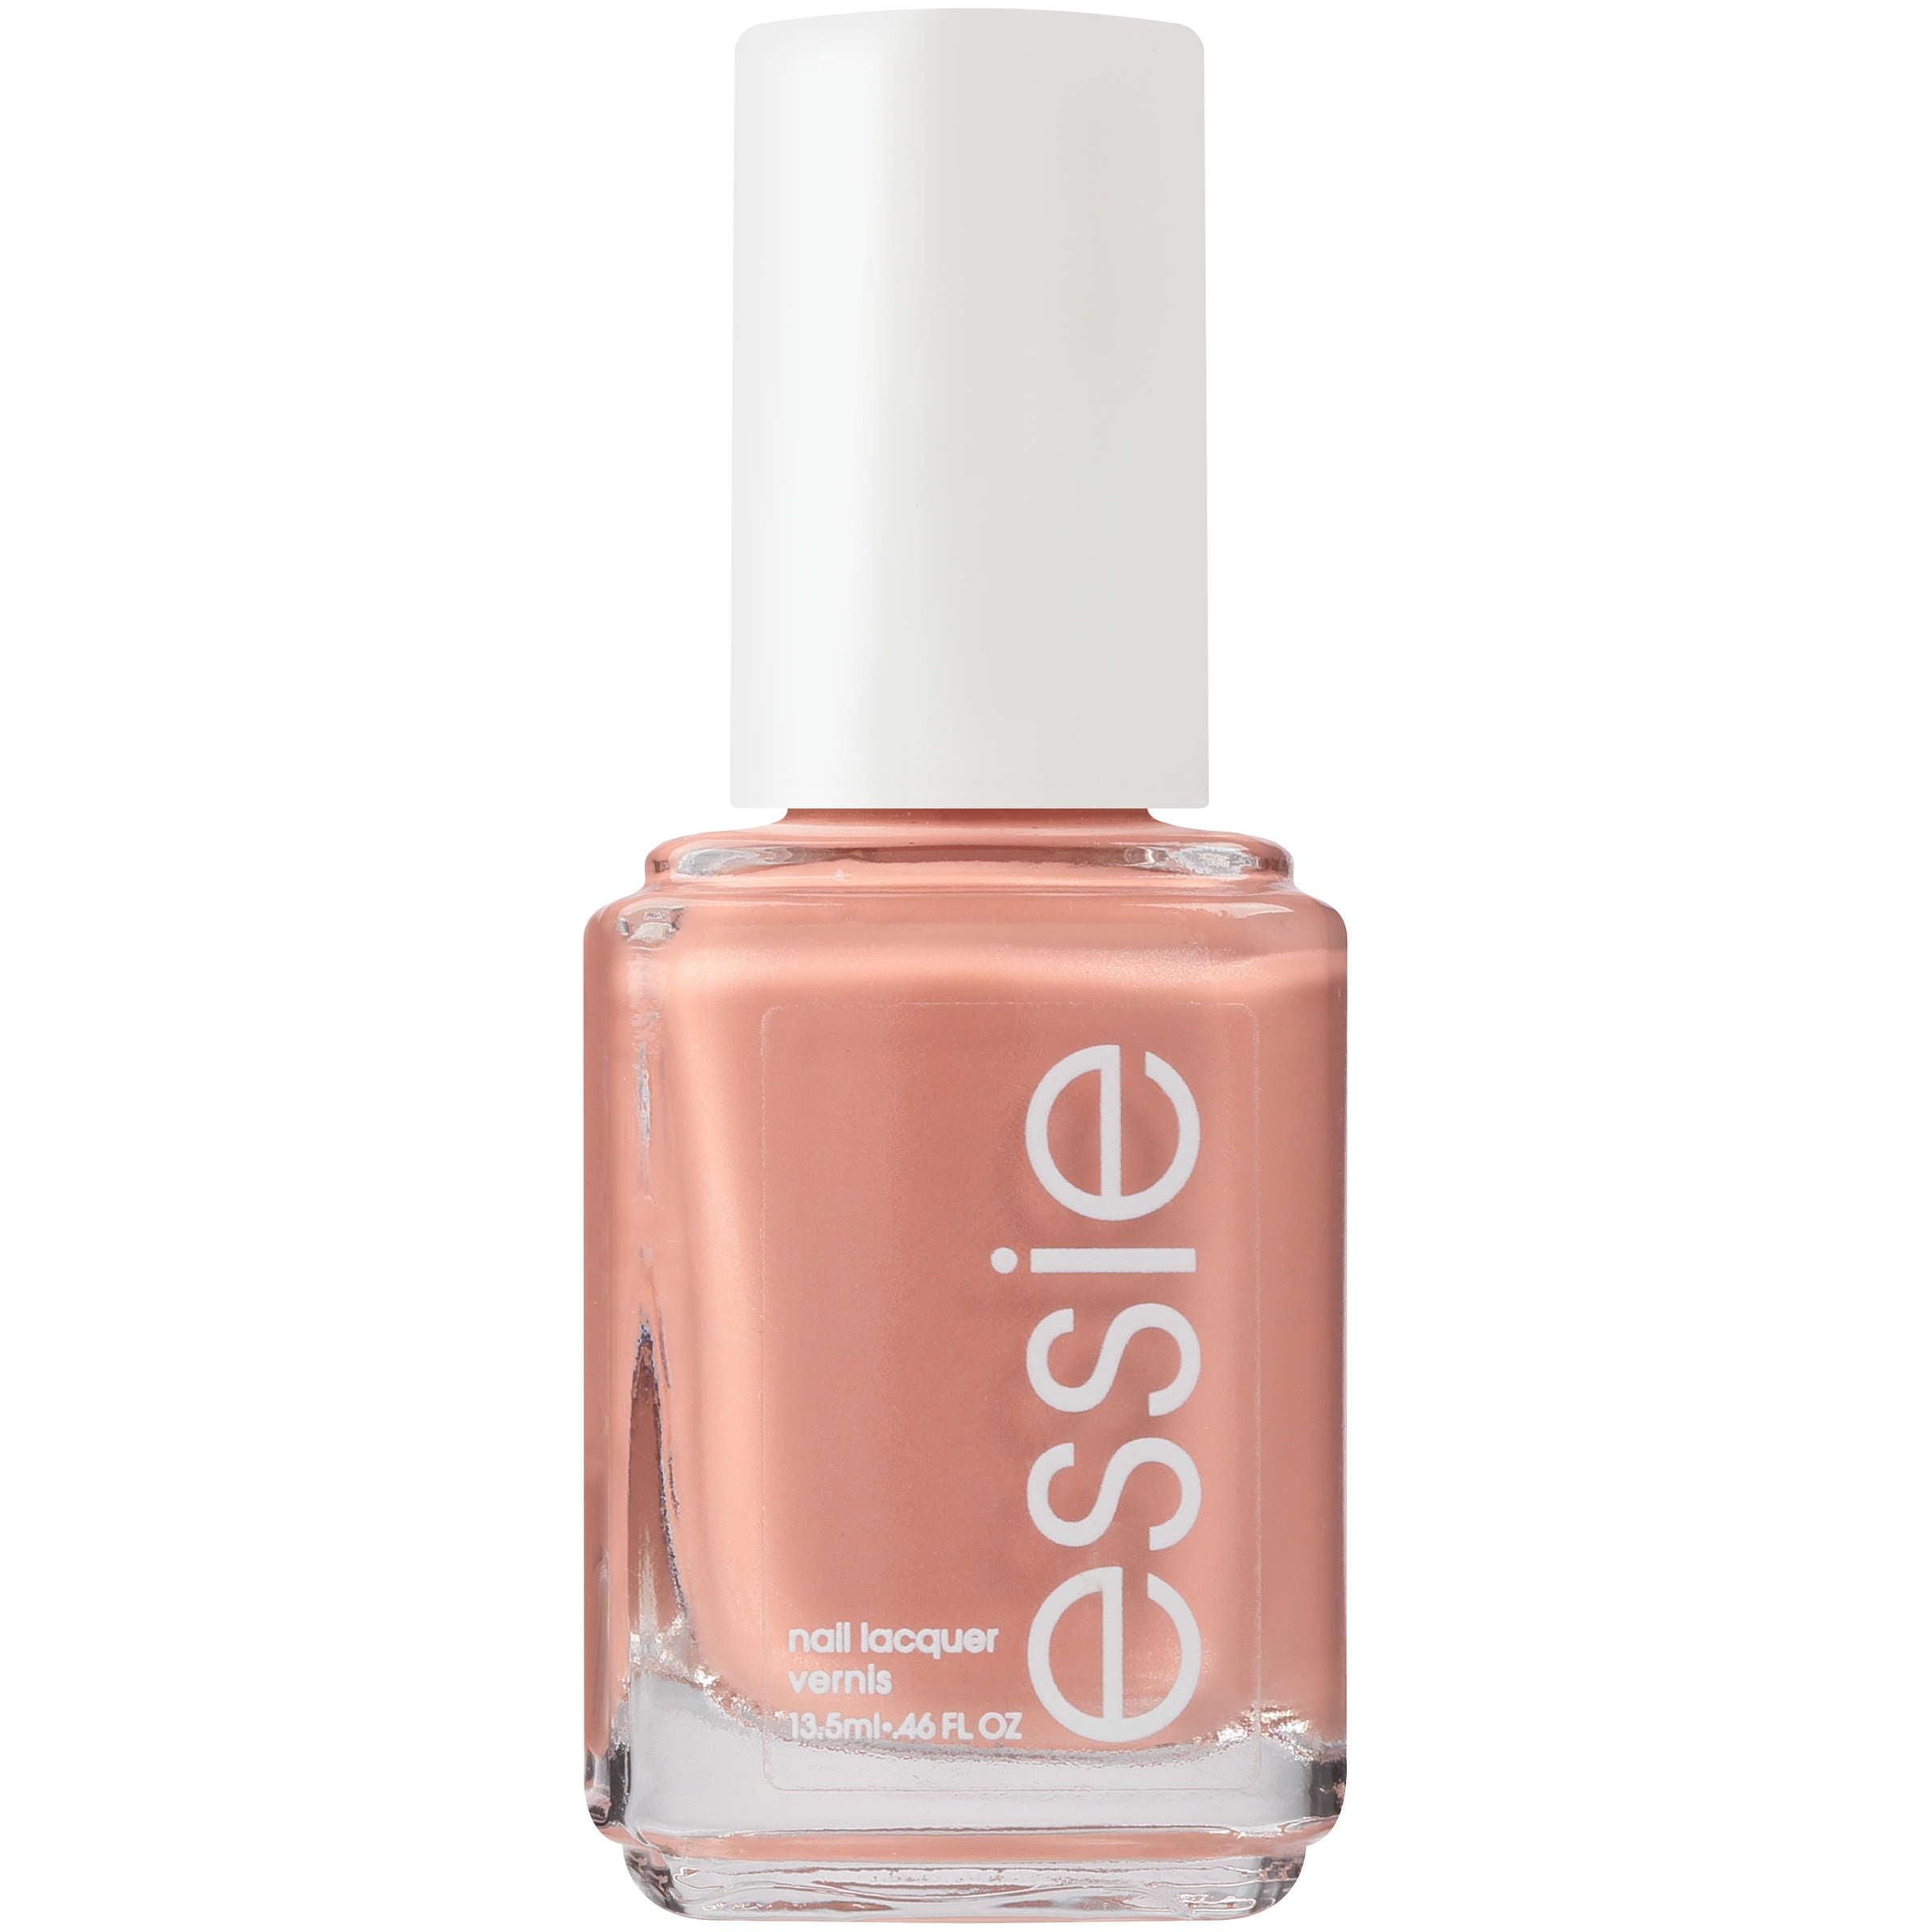 essie Nail Polish (Nudes), Bare With Me, 0.46 fl oz - Walmart.com